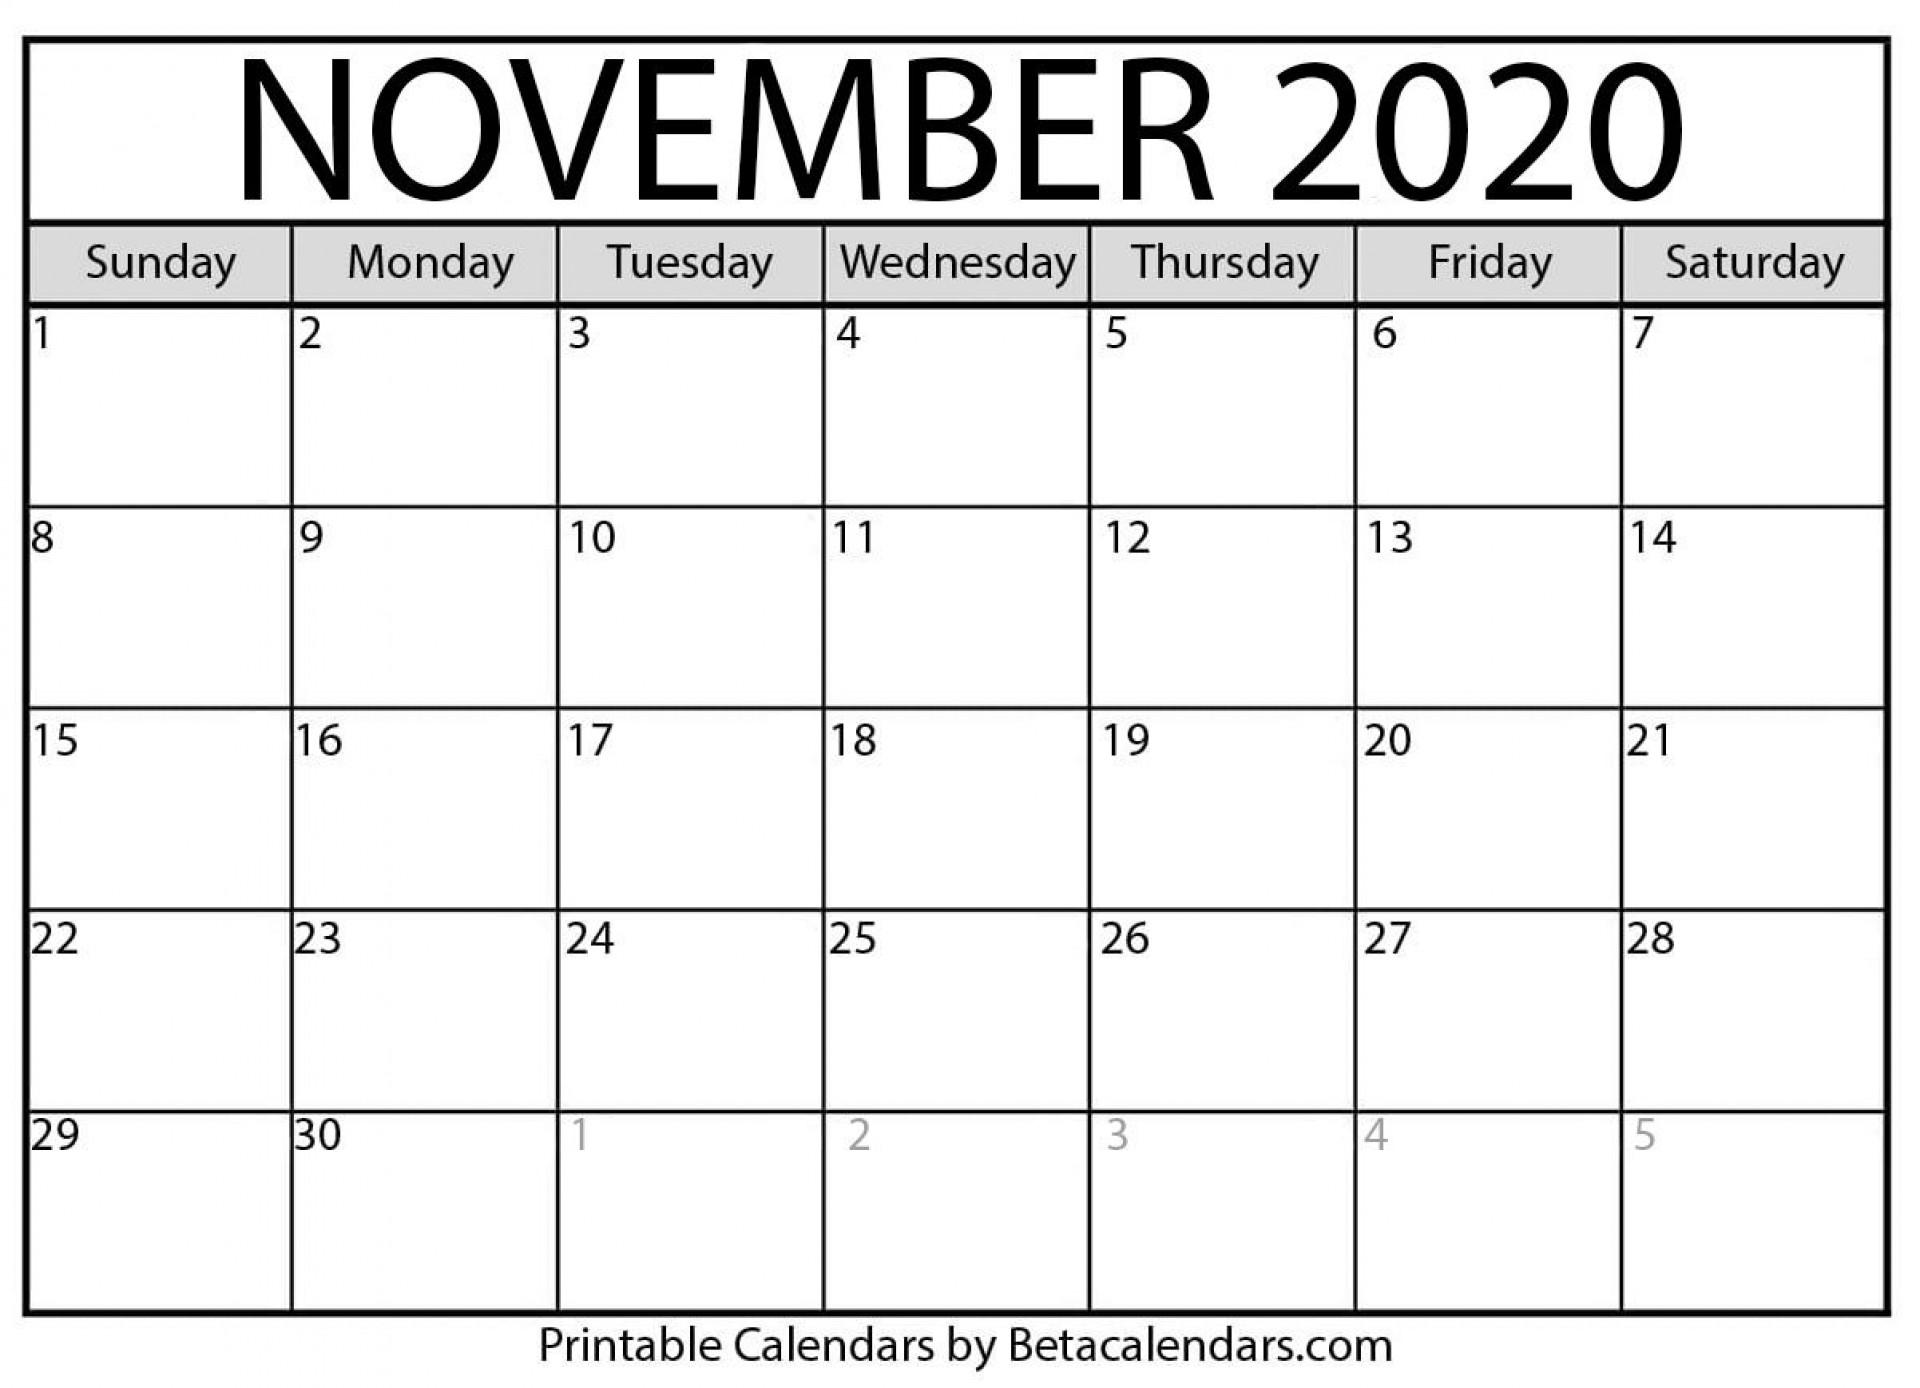 005 Best Printable Calendar Template November 2020 High Resolution  Free1920